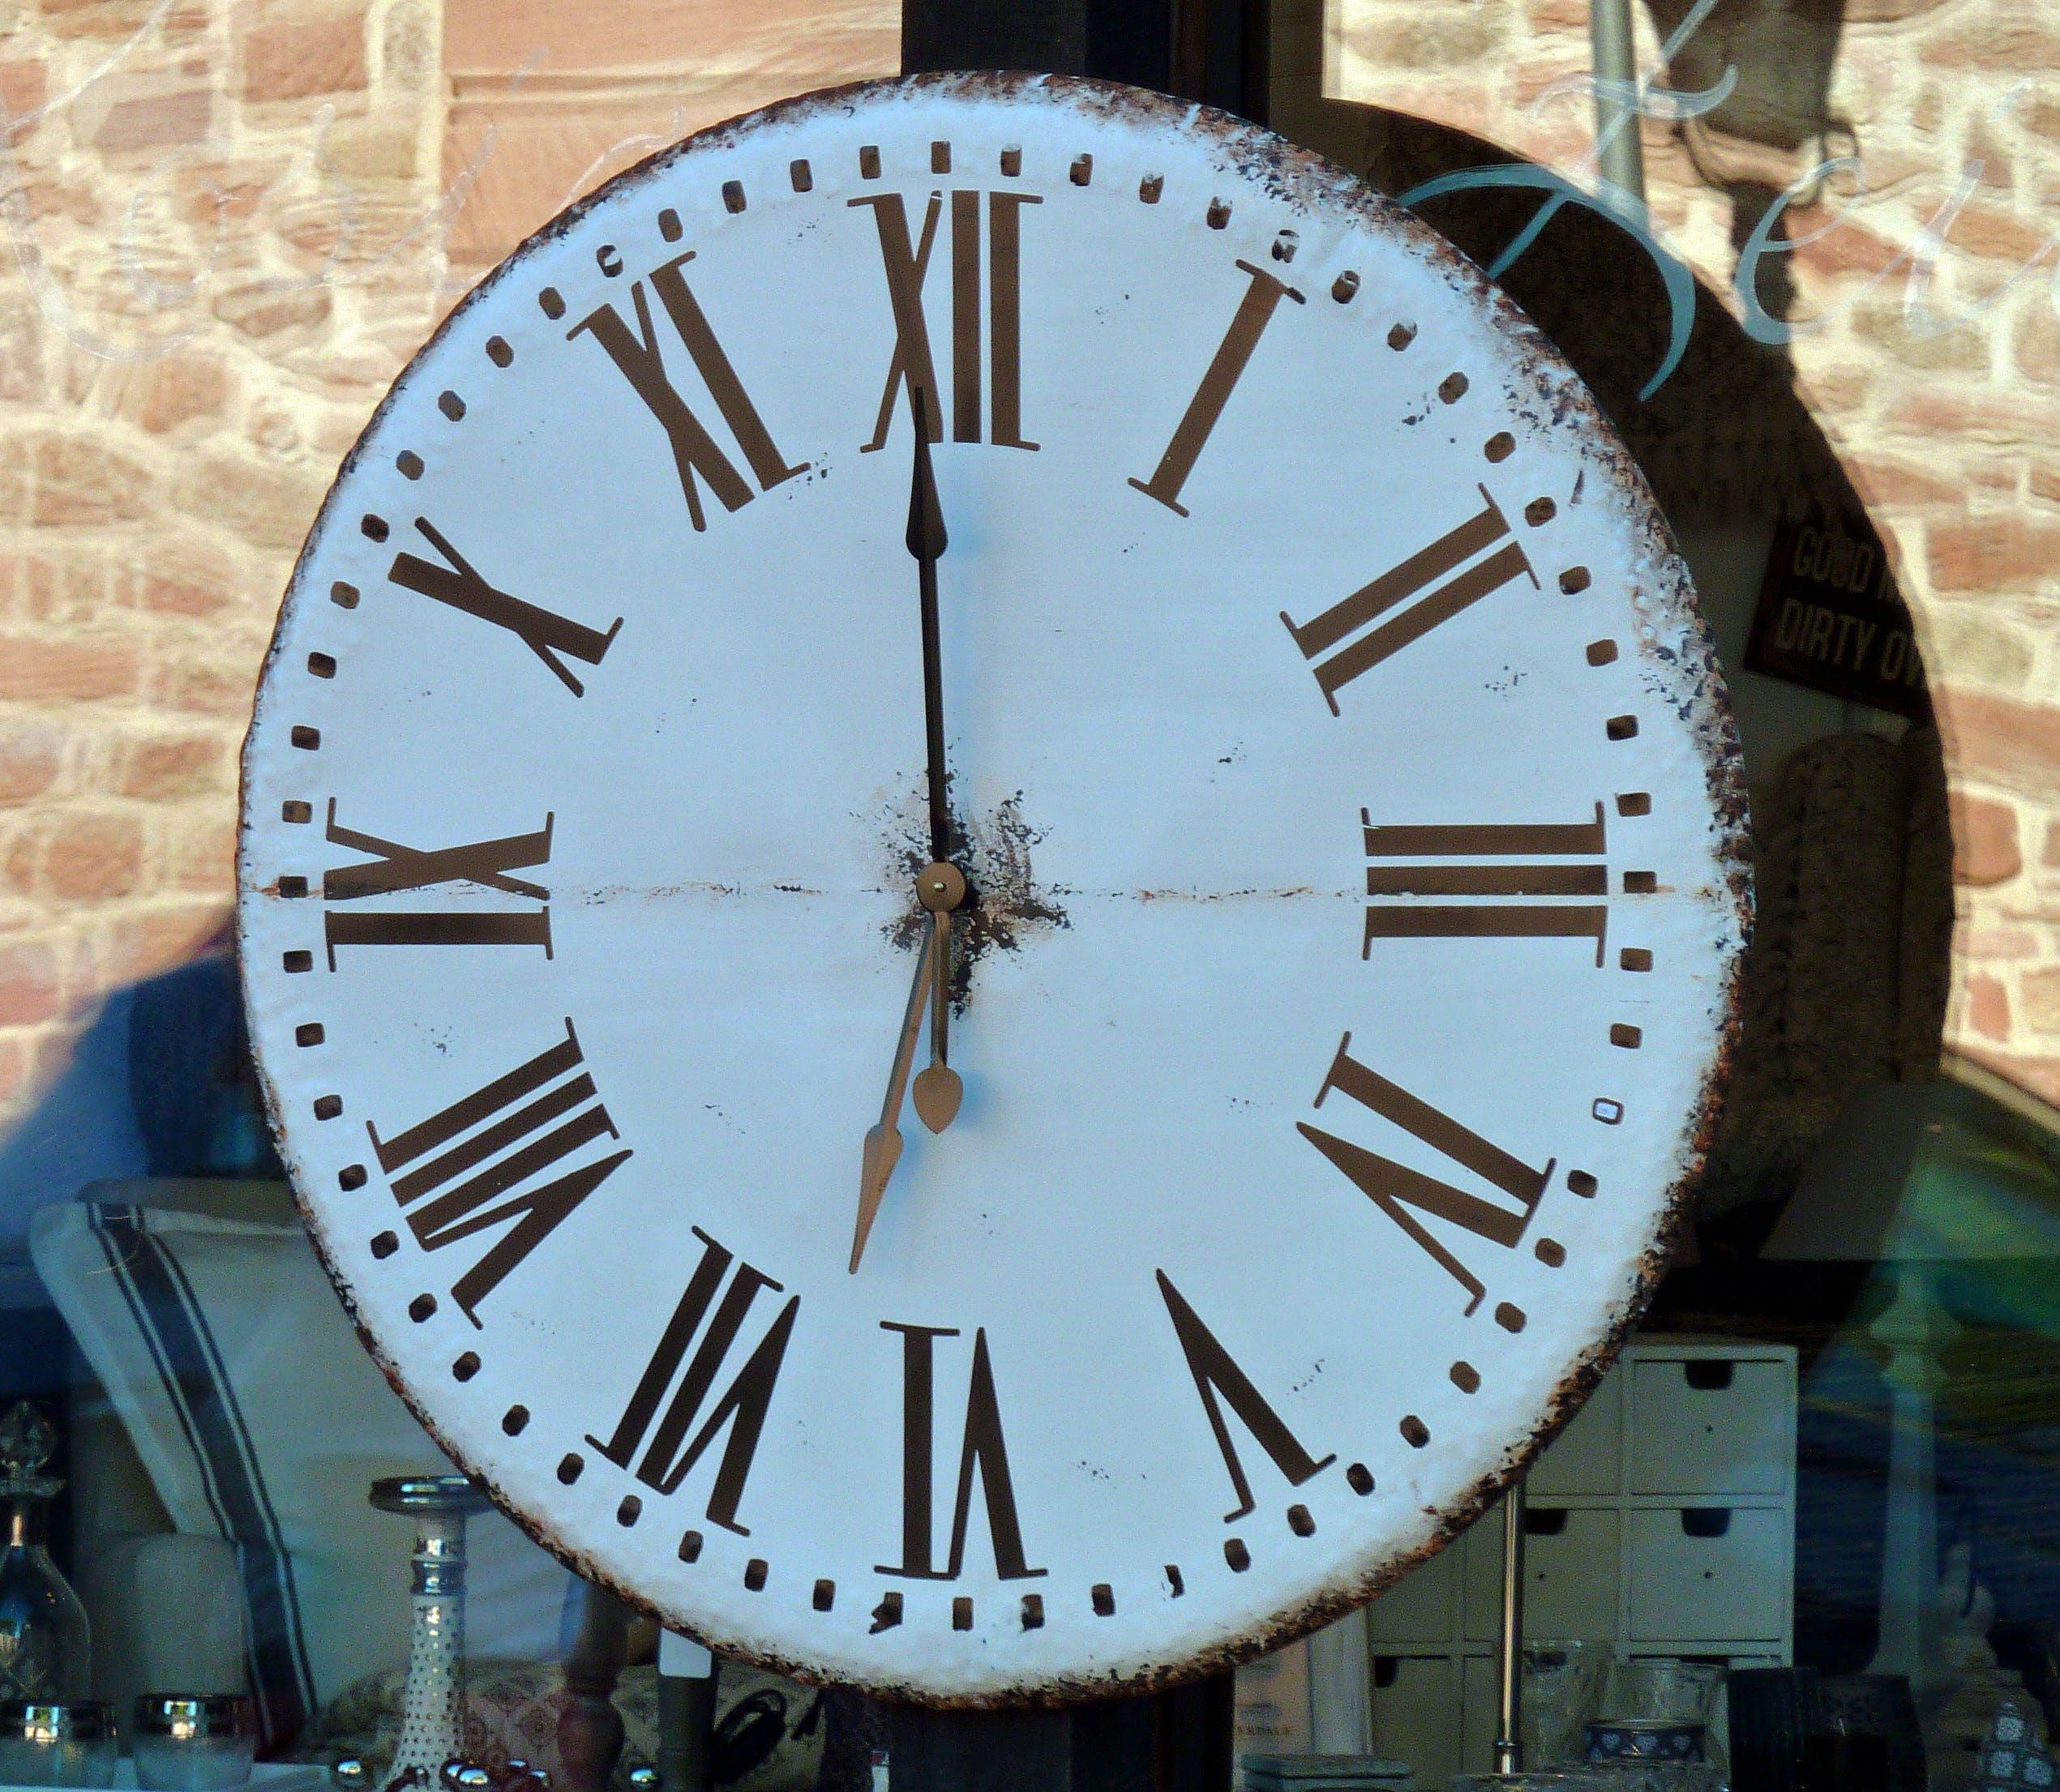 Free stock photo of time, clock, analog, movement